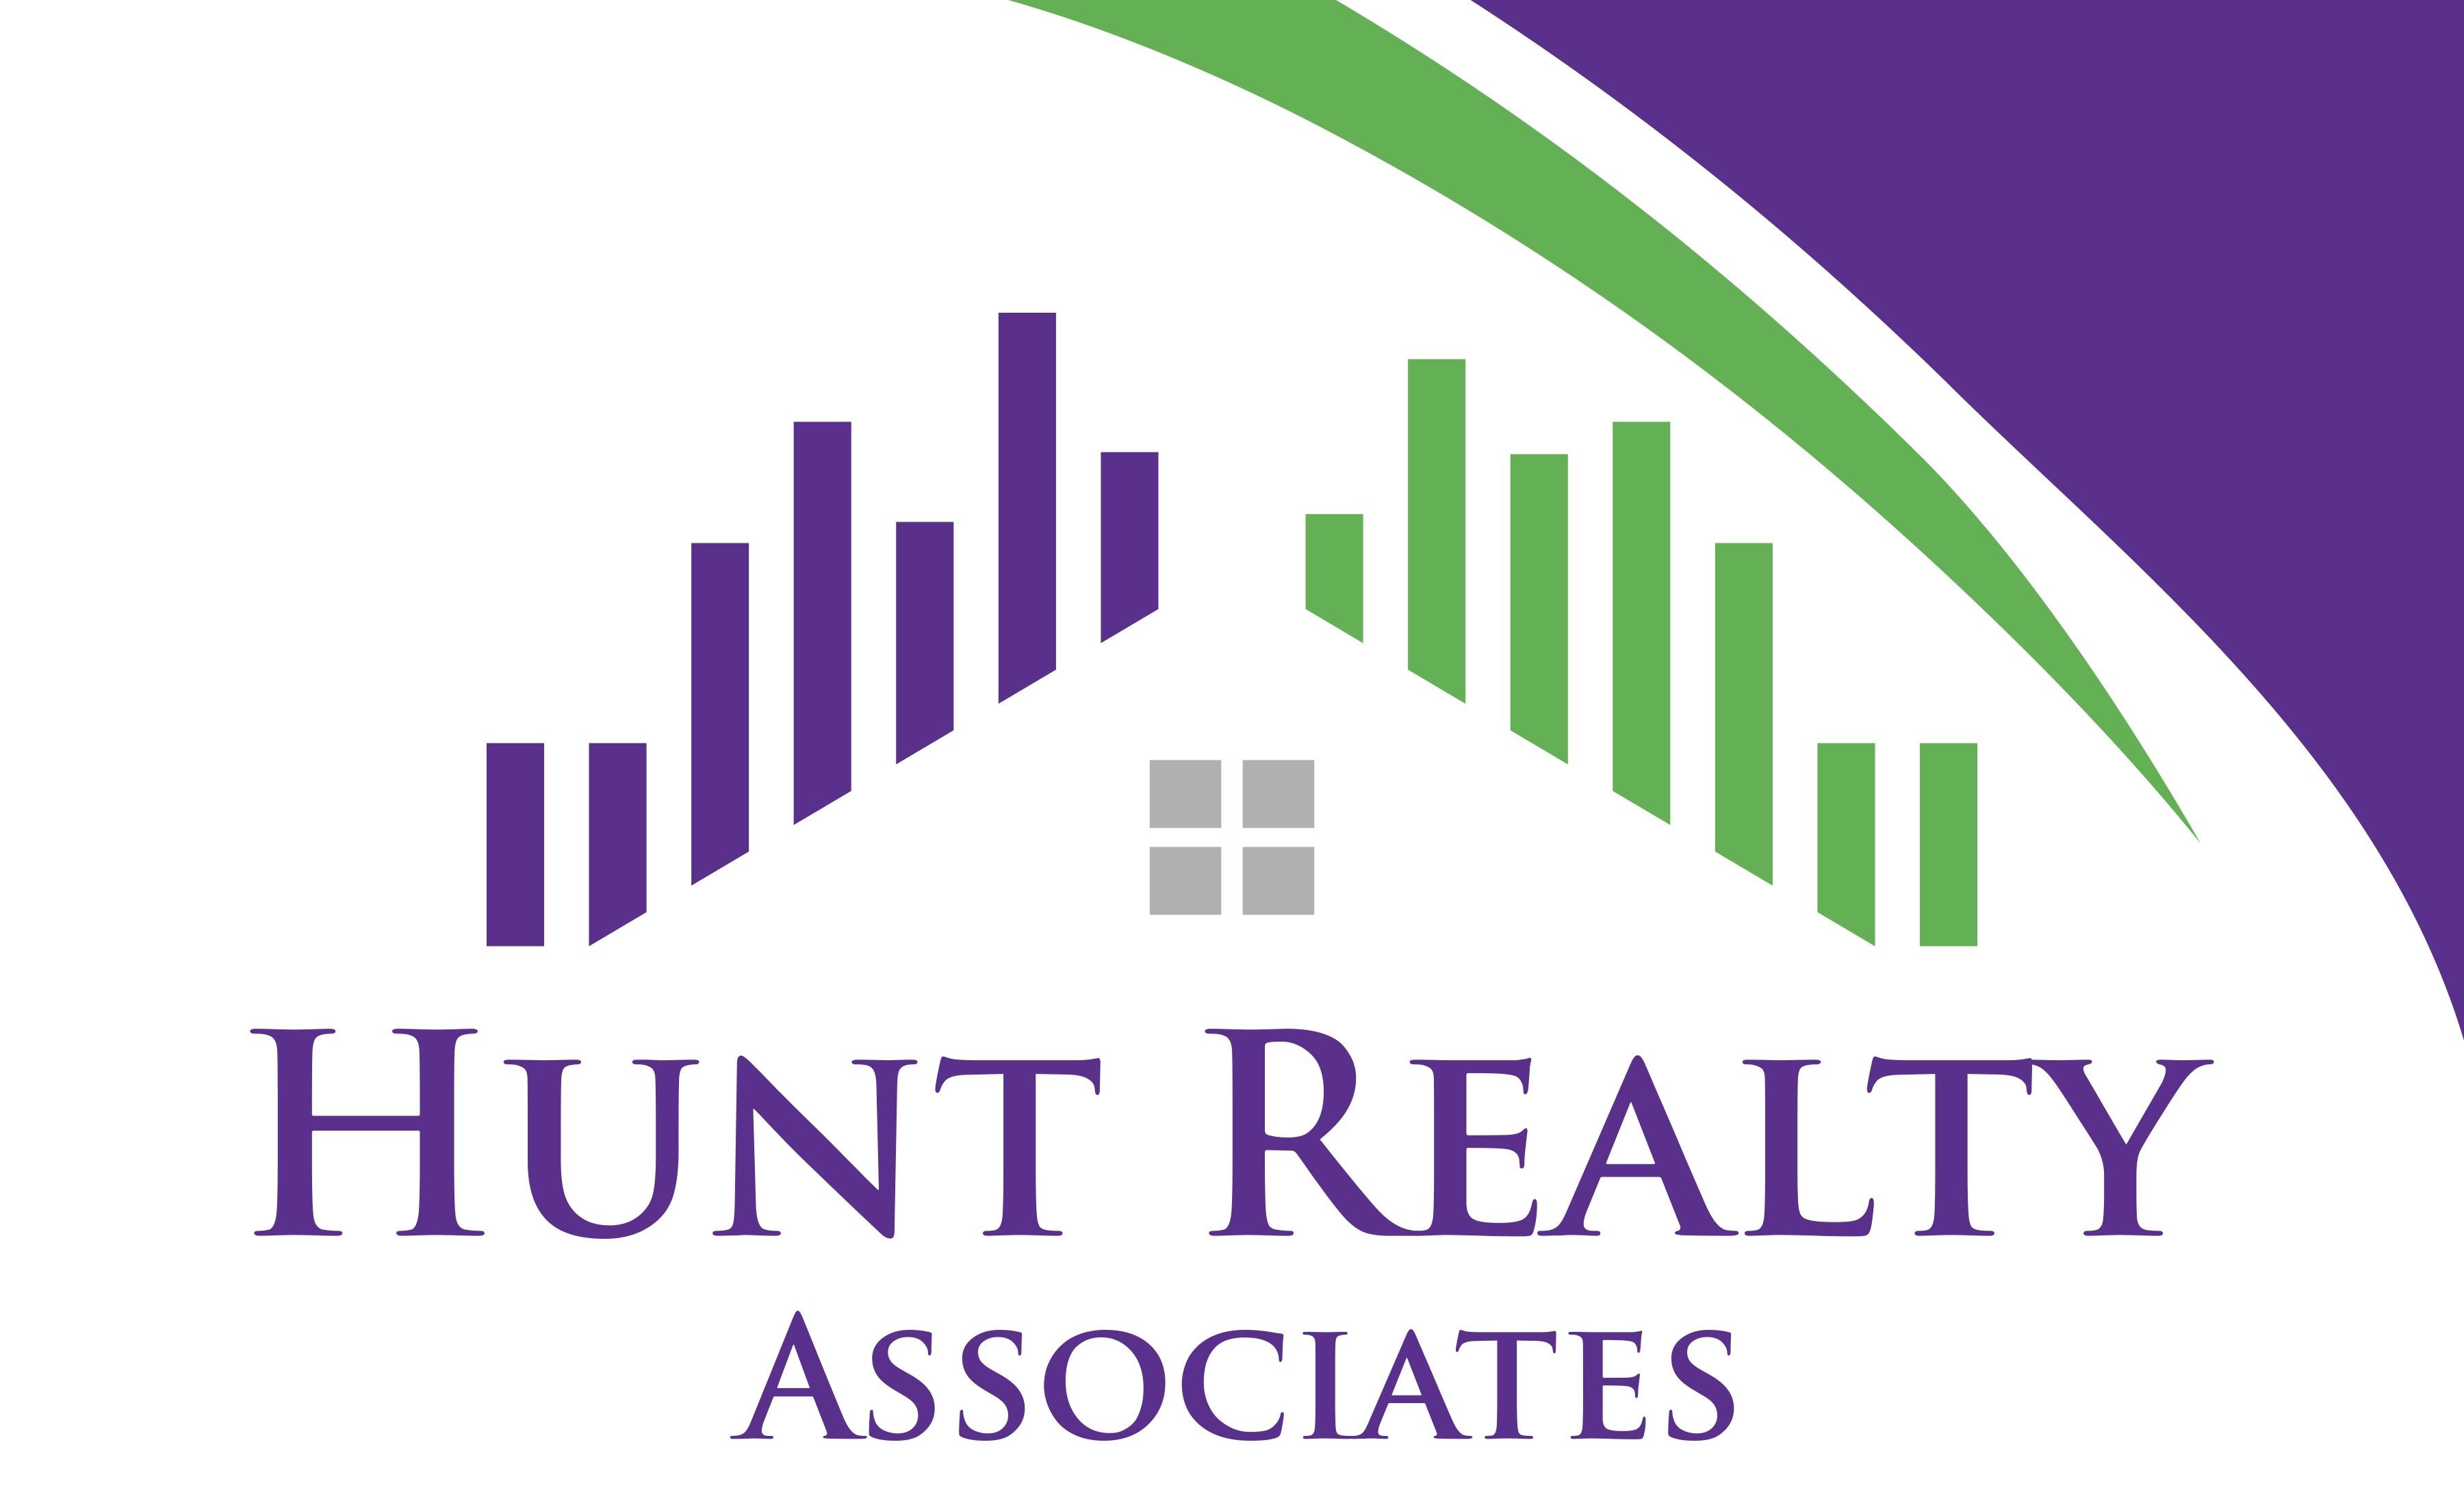 Hunt Realty Associates